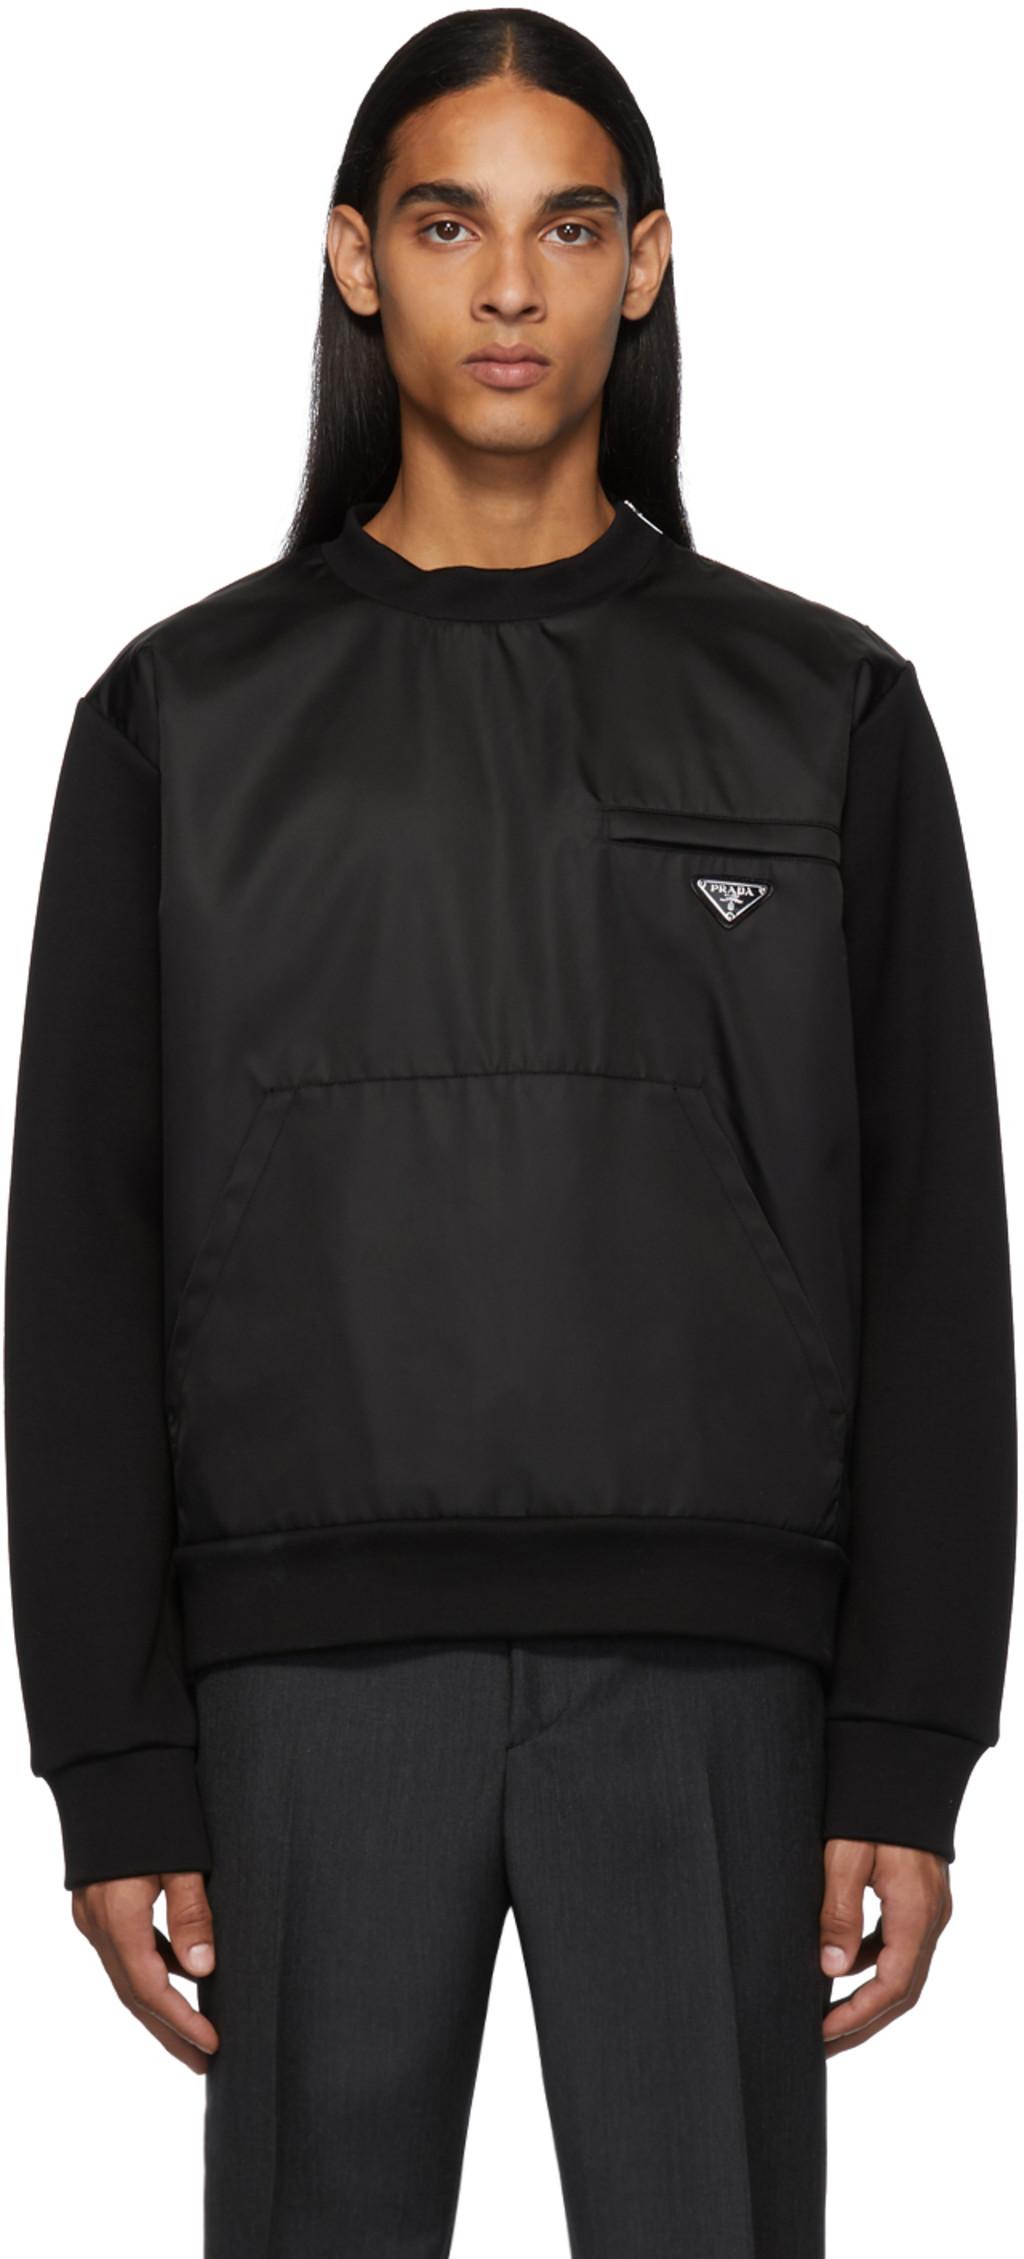 b3b4fc3526 Black Nylon Knit Sweatshirt